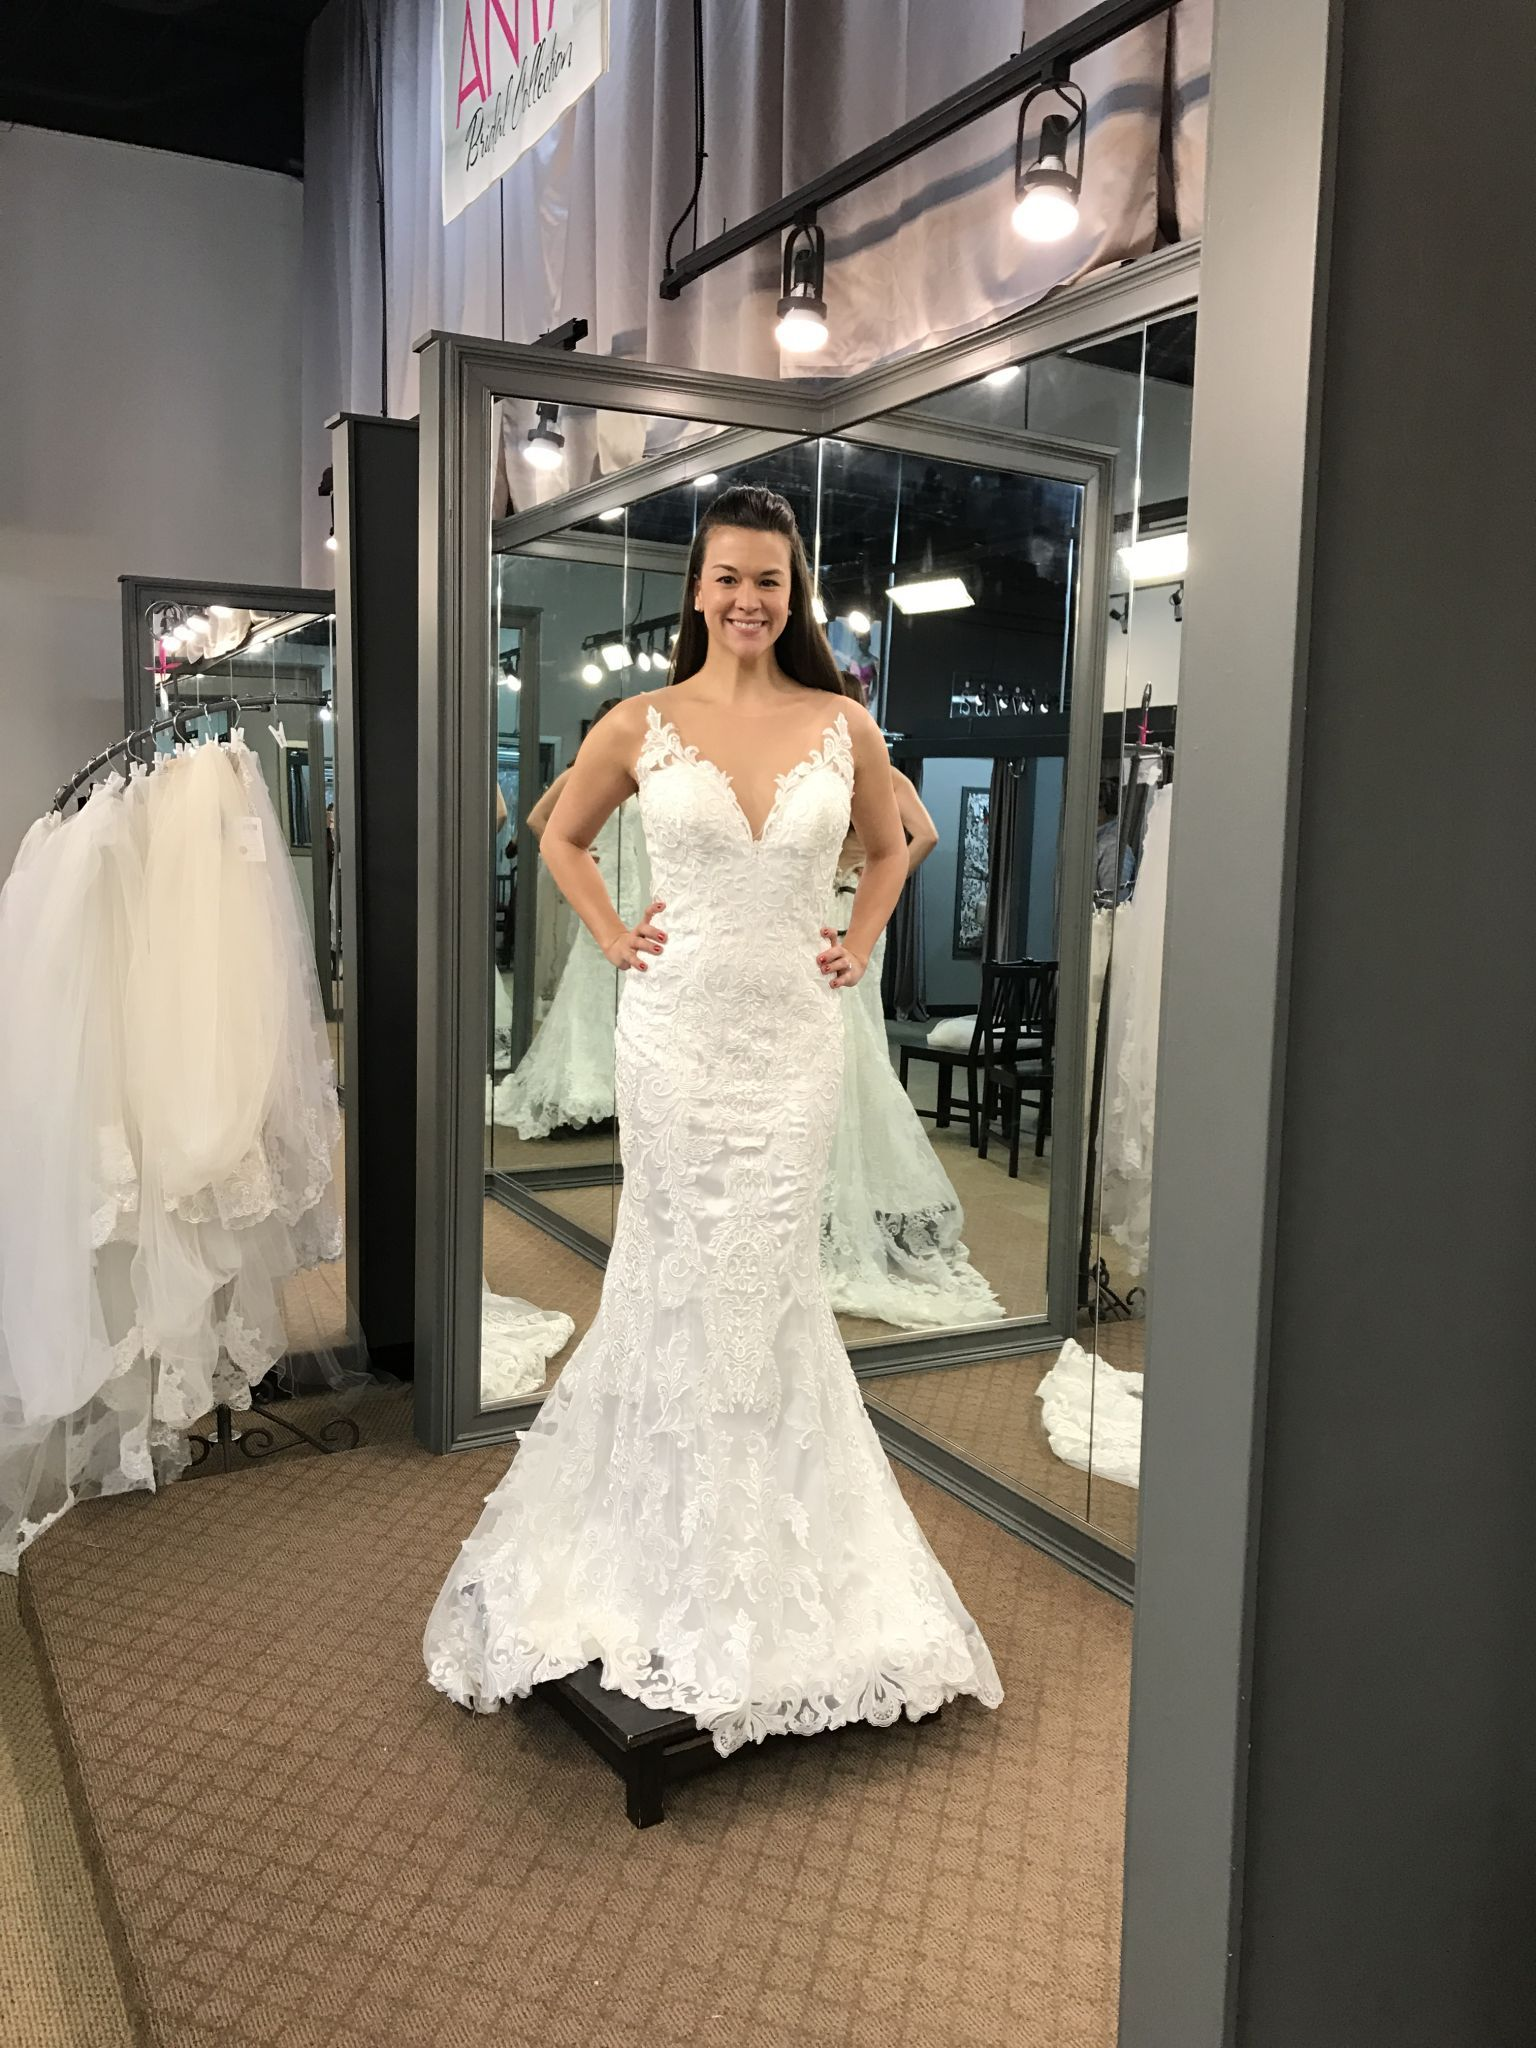 b32e72a185f3a Madison James MJ 271, $900 Size: 10 | New (Un-Altered) Wedding ...